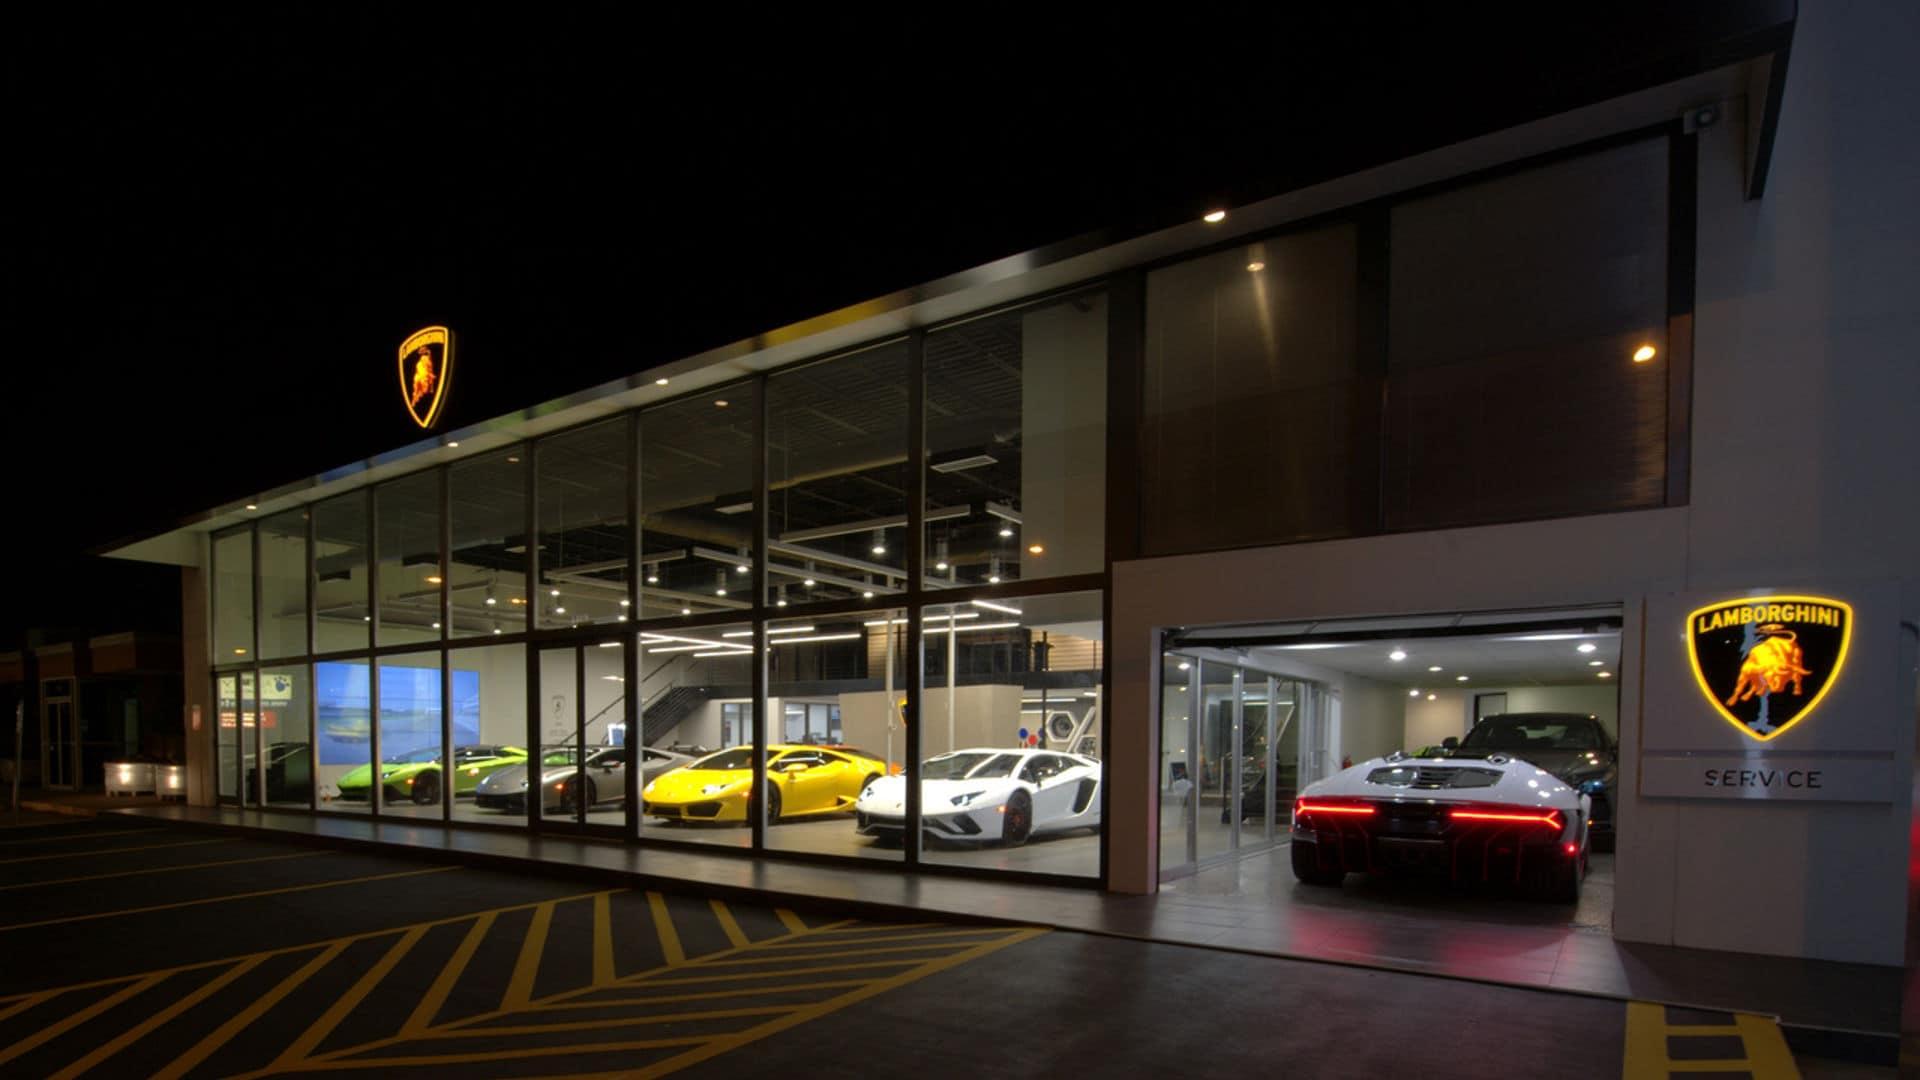 dealerships switzerland managed new world over has lugano around autoevolution establish to countries in dealership lamborghini the opens news